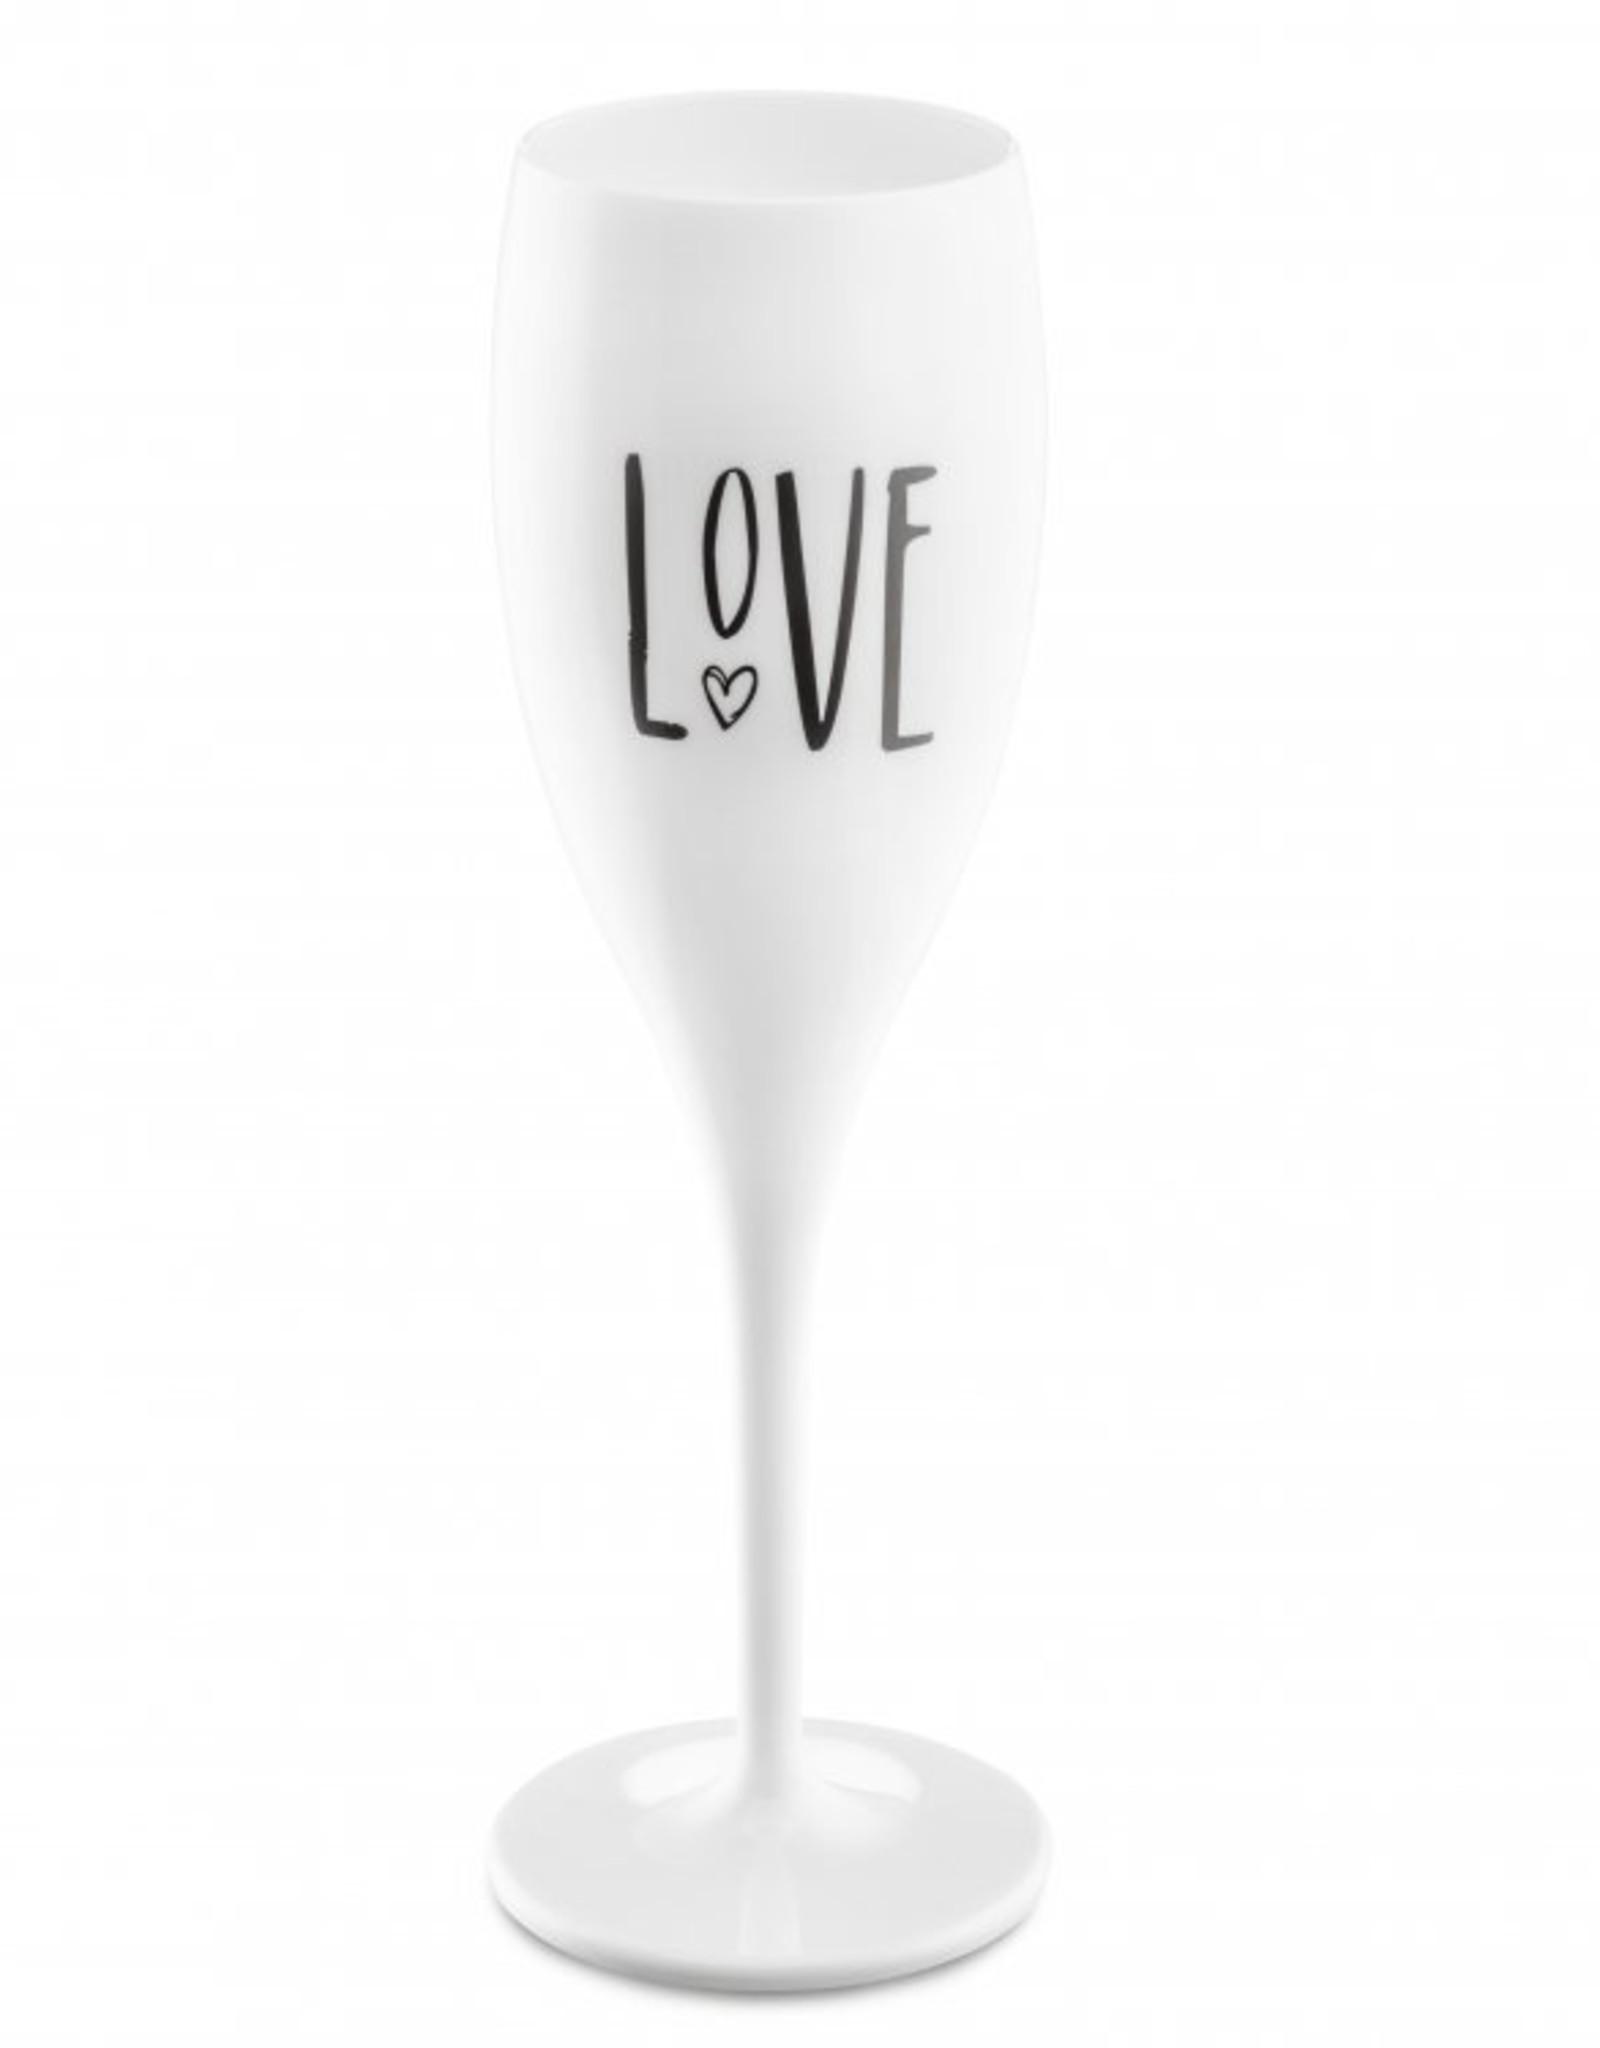 Koziol Koziol Champagneglas - Cheers No.1 Love - 100 ml - Cotton white - Set van 6